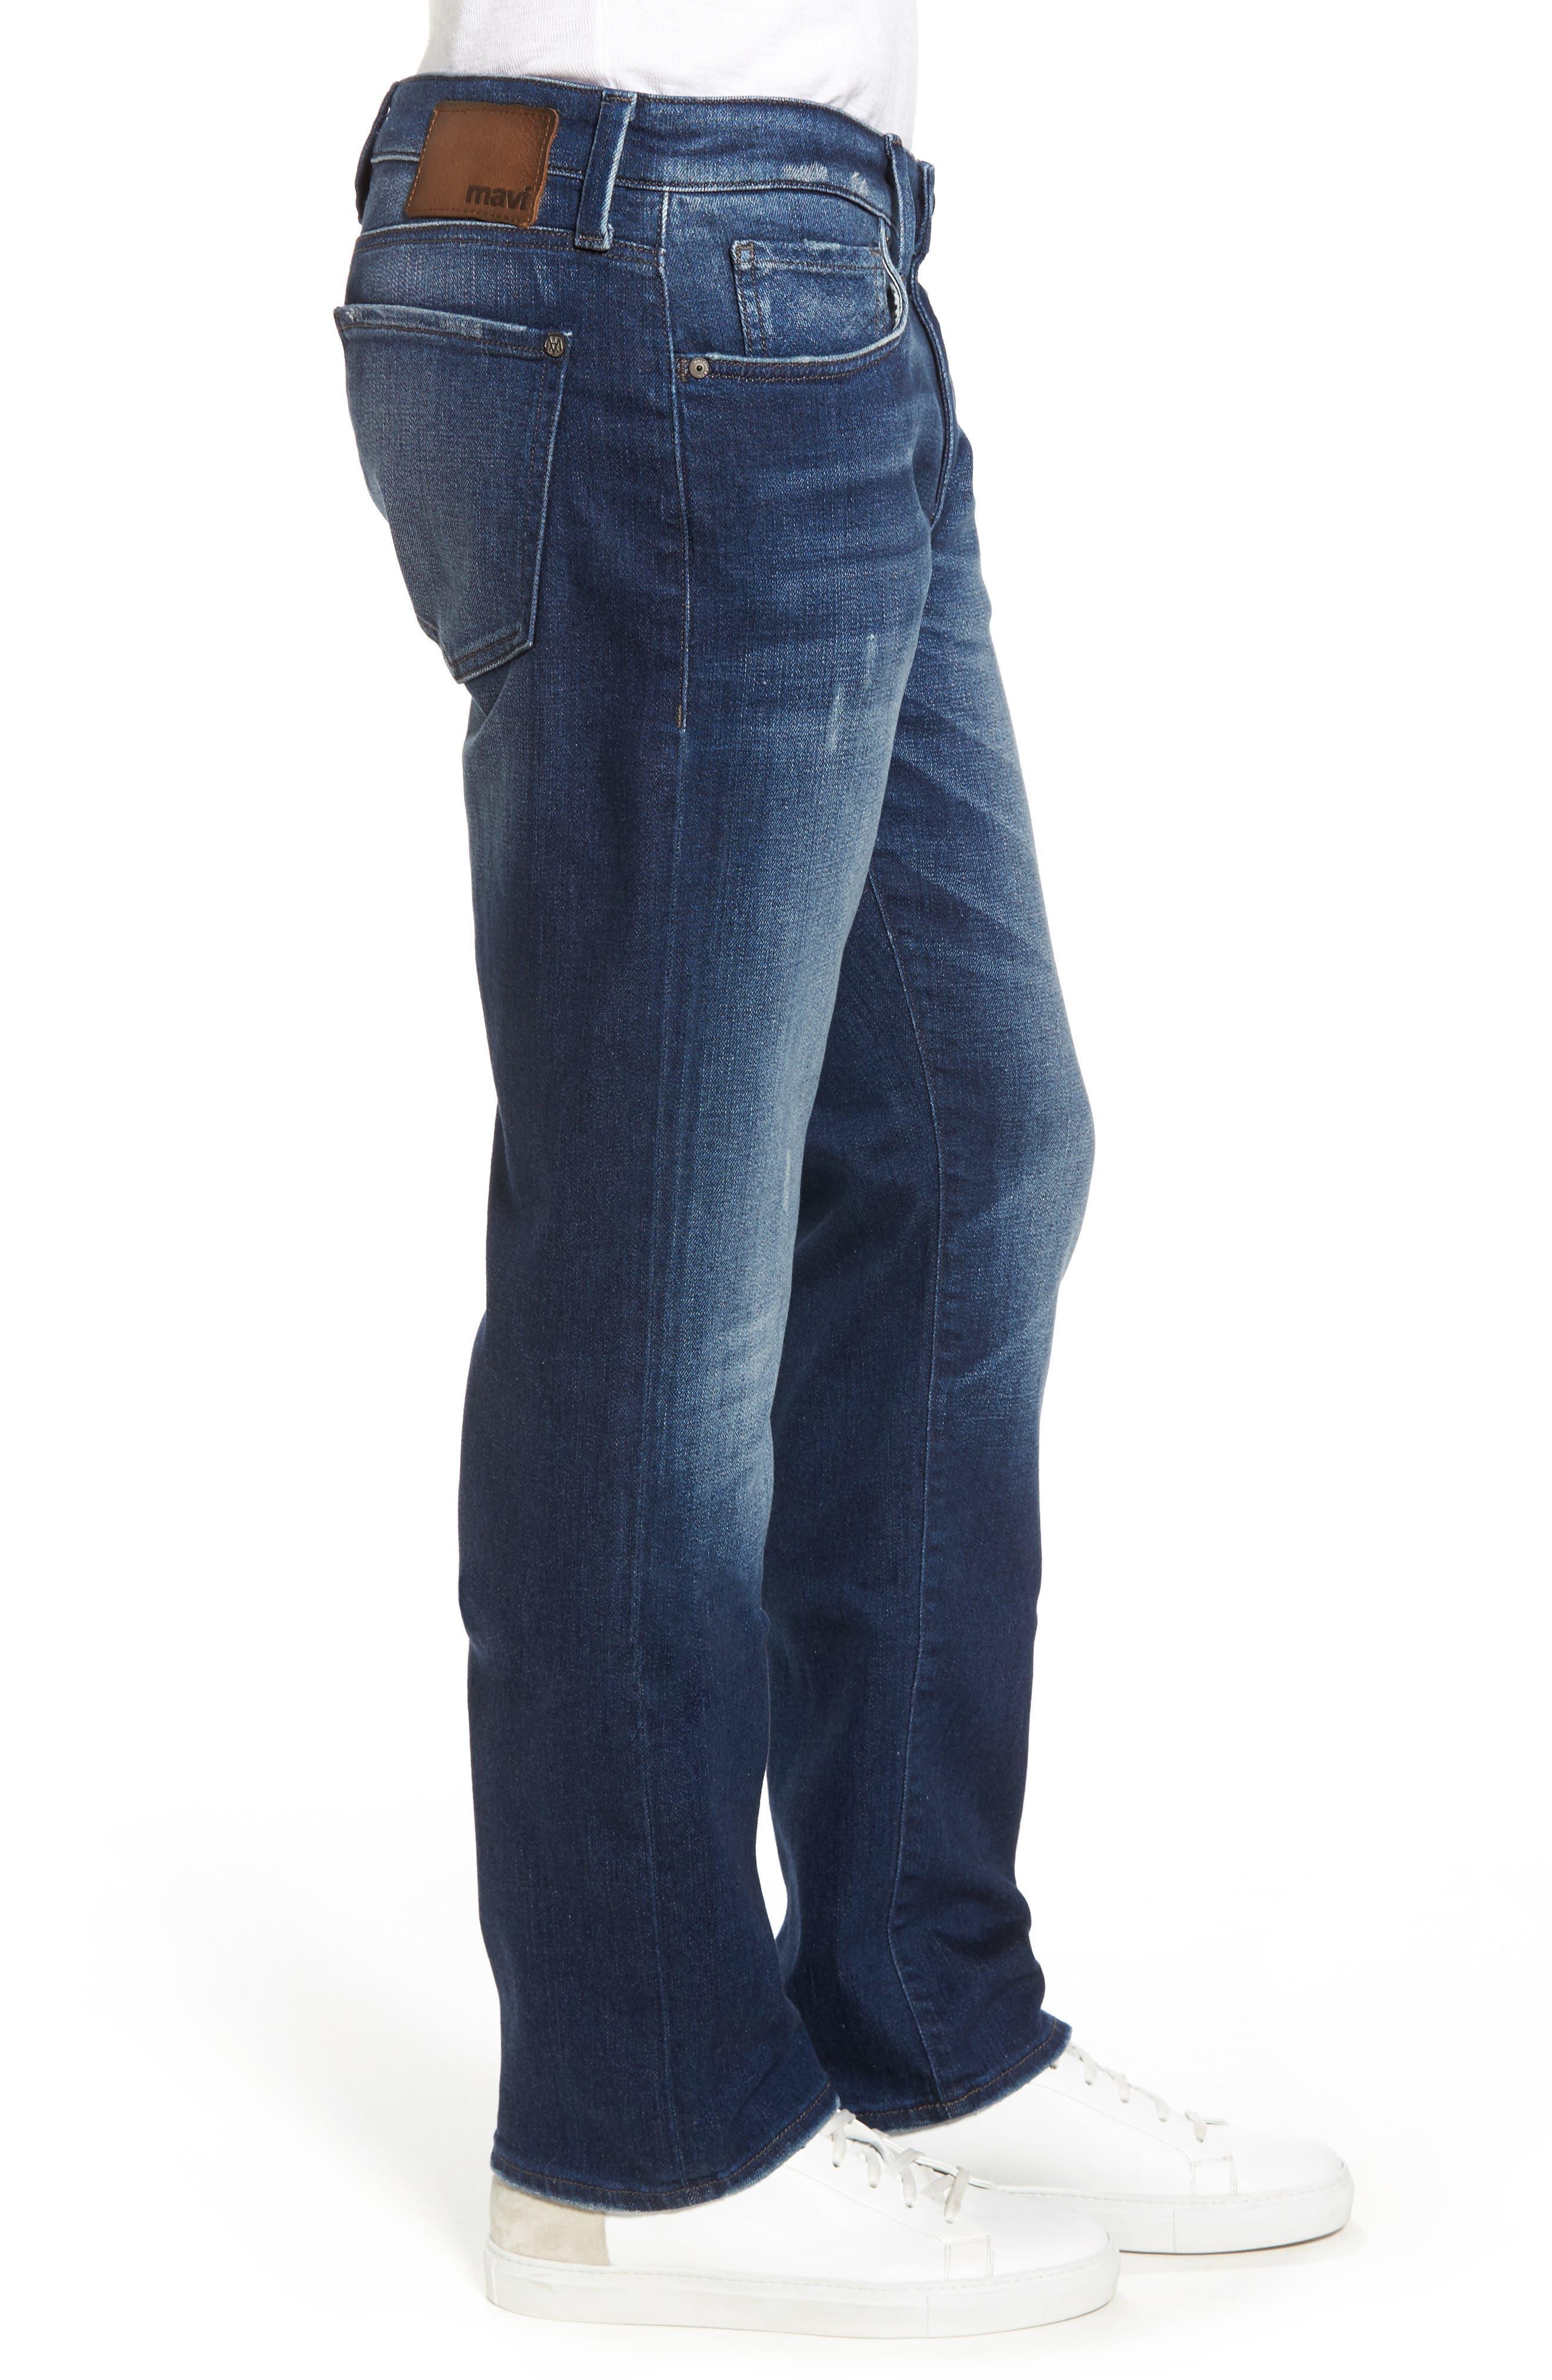 Zach Straight Leg Jeans,                             Alternate thumbnail 3, color,                             Dark Brooklyn